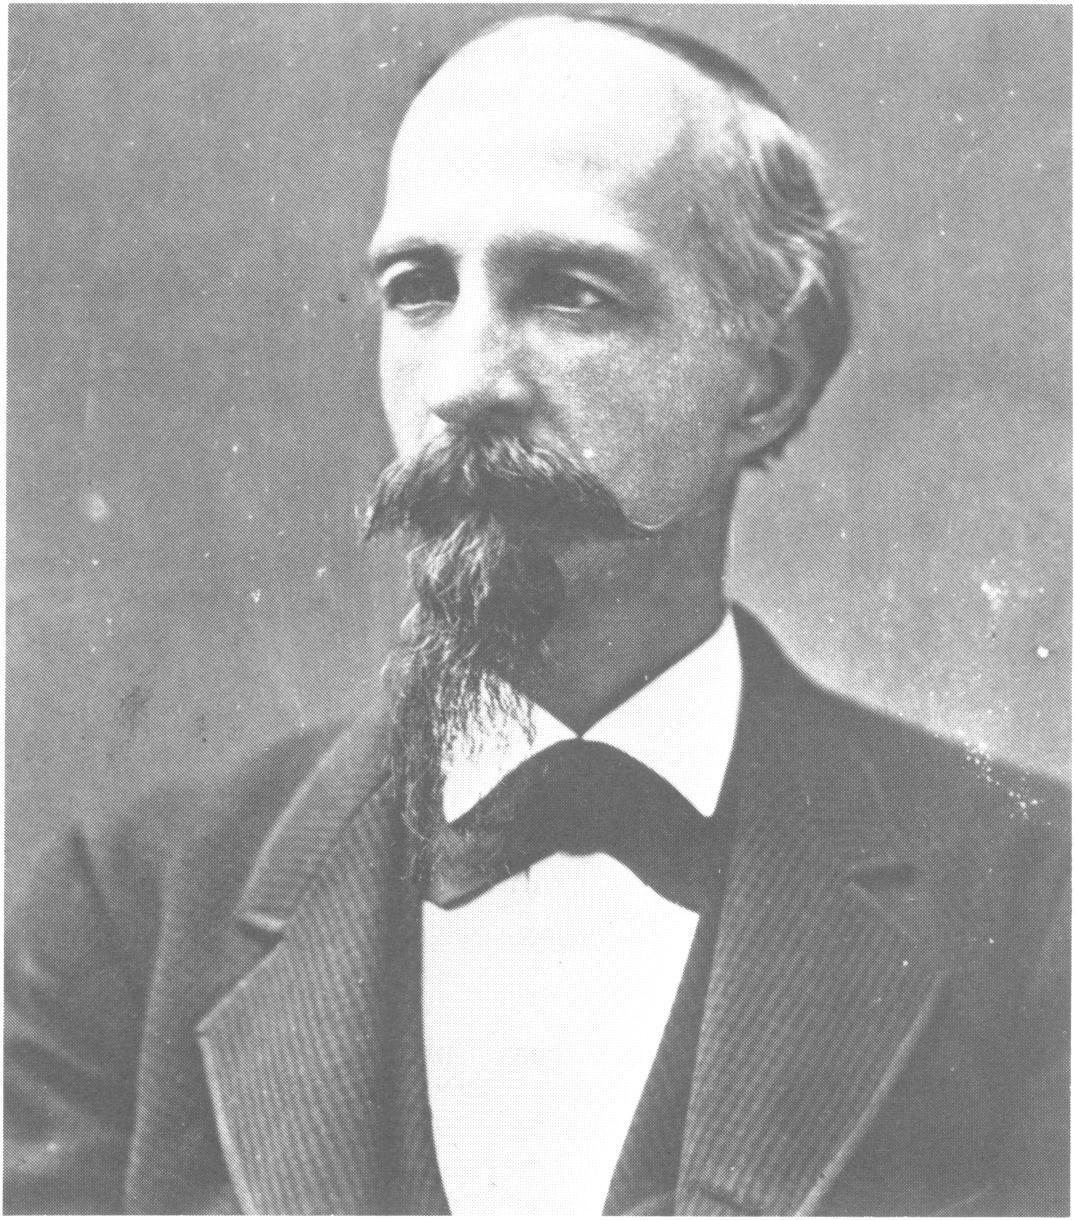 ▲▼Legrand G. Capers(圖/翻攝自維基百科)